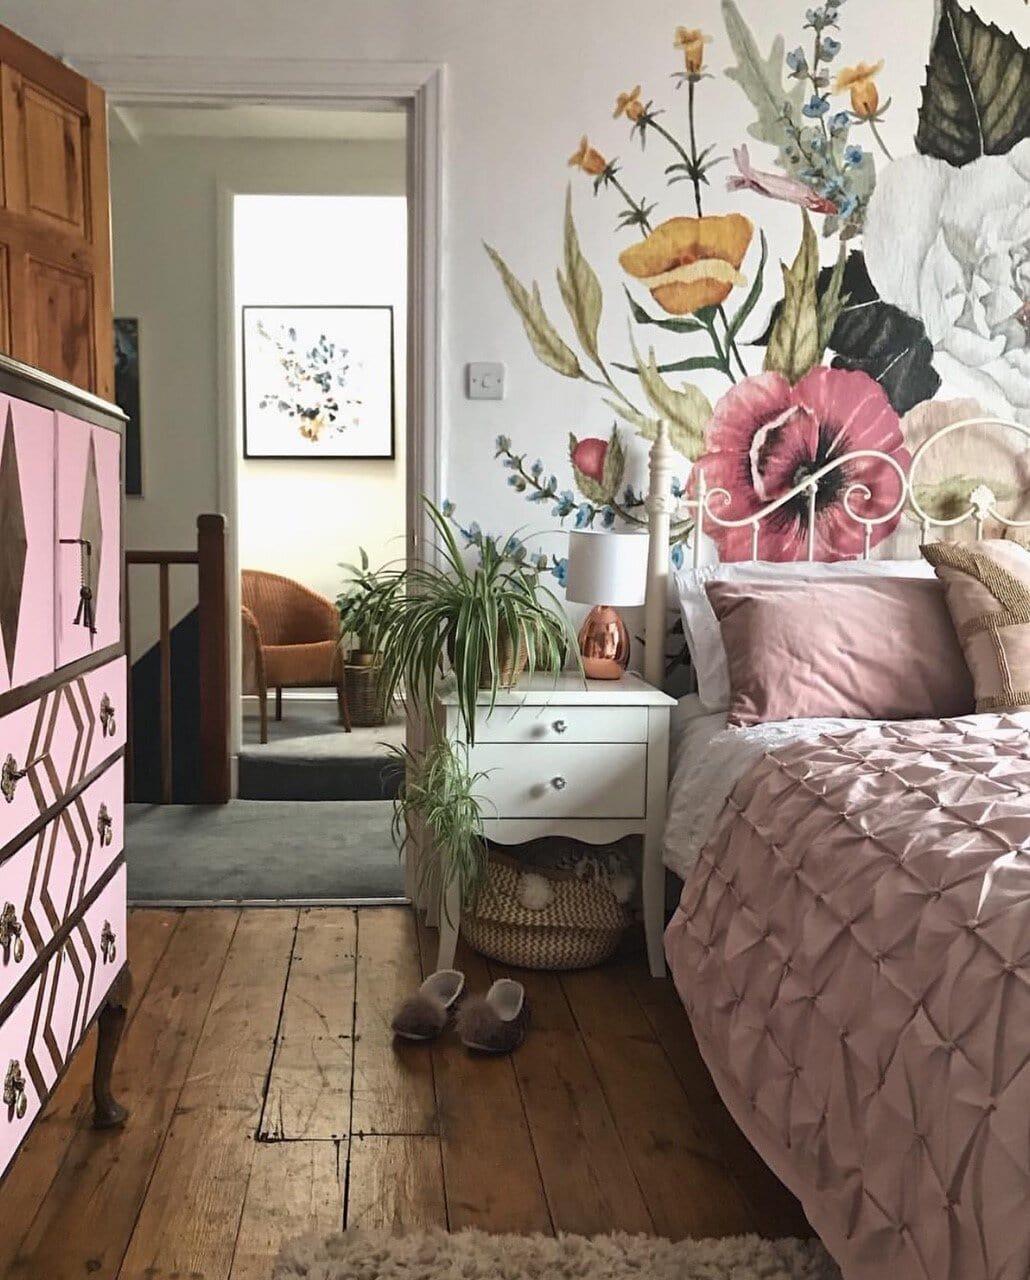 interior design, instagram, instagram trends, home decor, social media, blogging, instagram advice, blogging advice, pinterest, wallpaper, bedroom